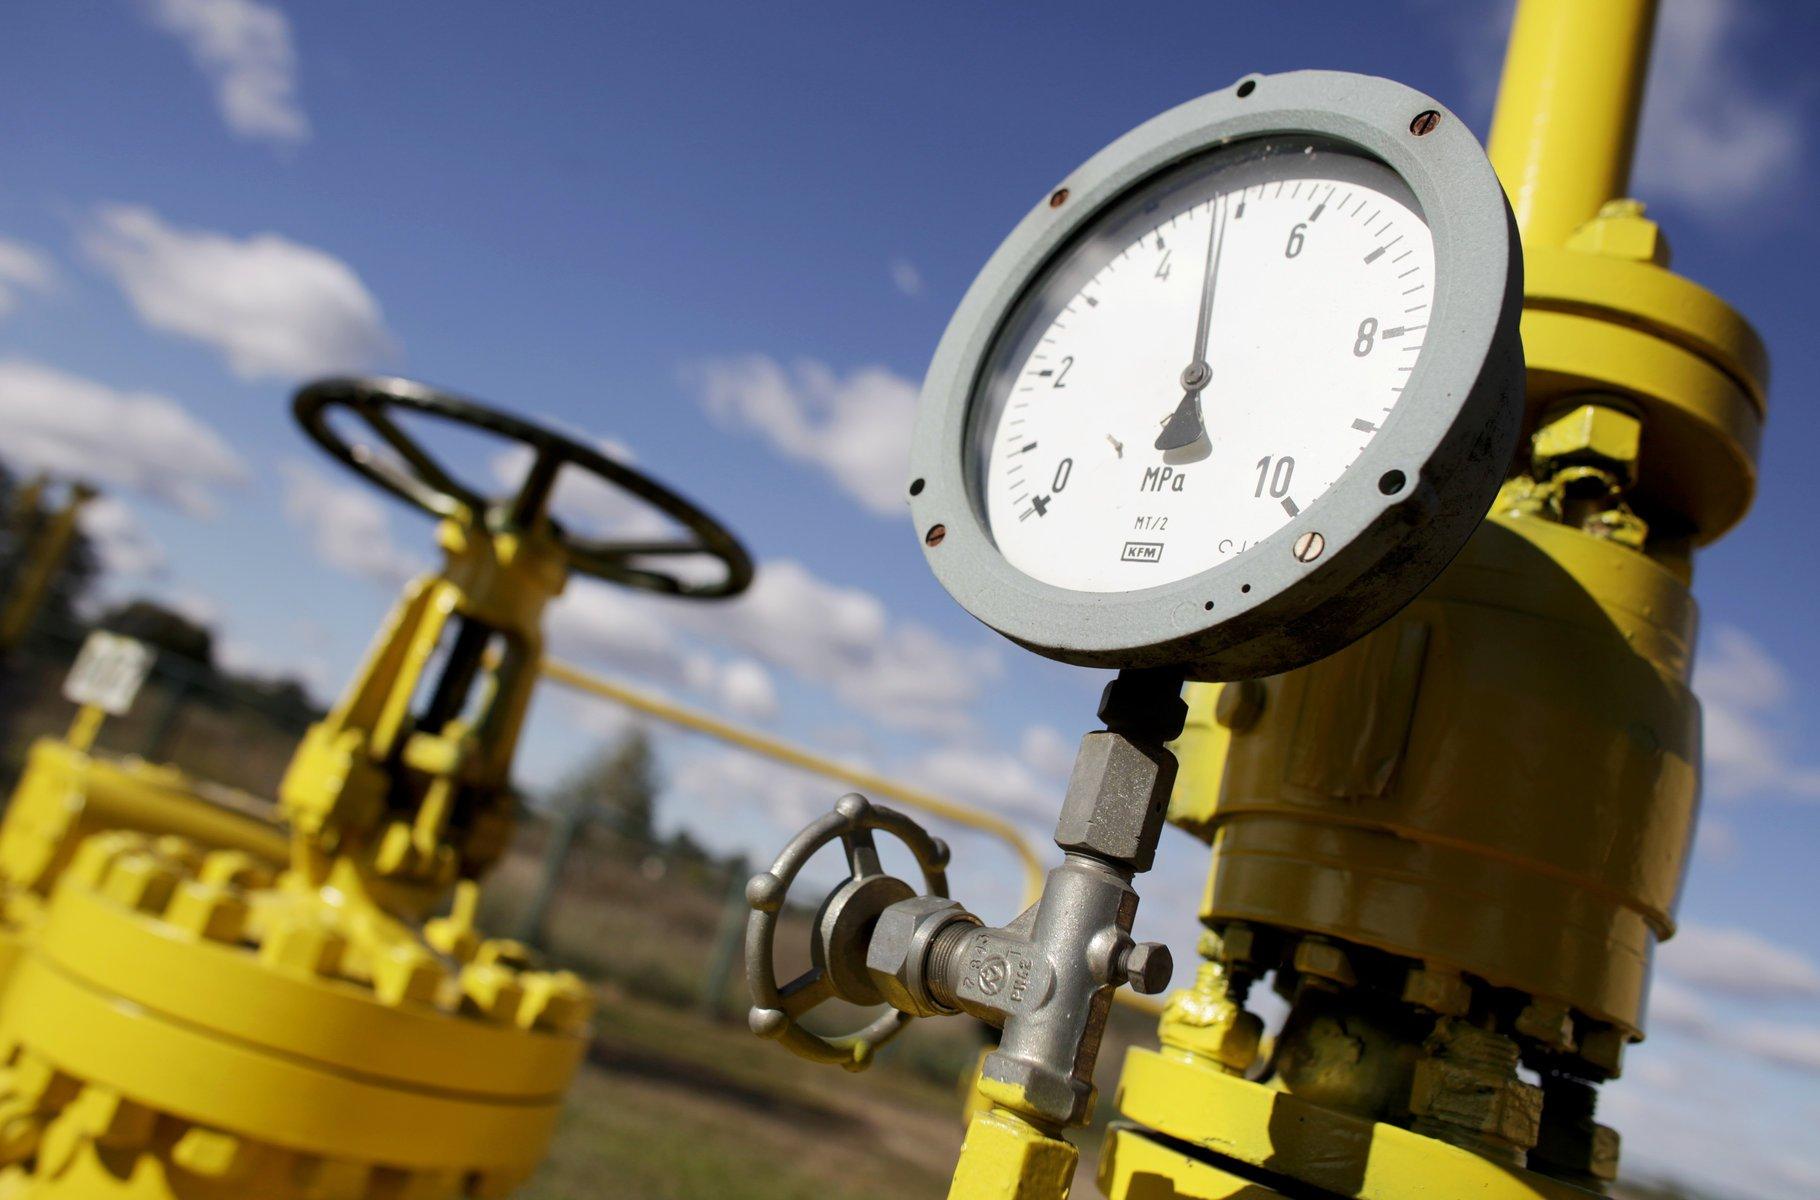 Из-за утечки газа прекращены поставки нагазопровод Сахалин-Комсомольск